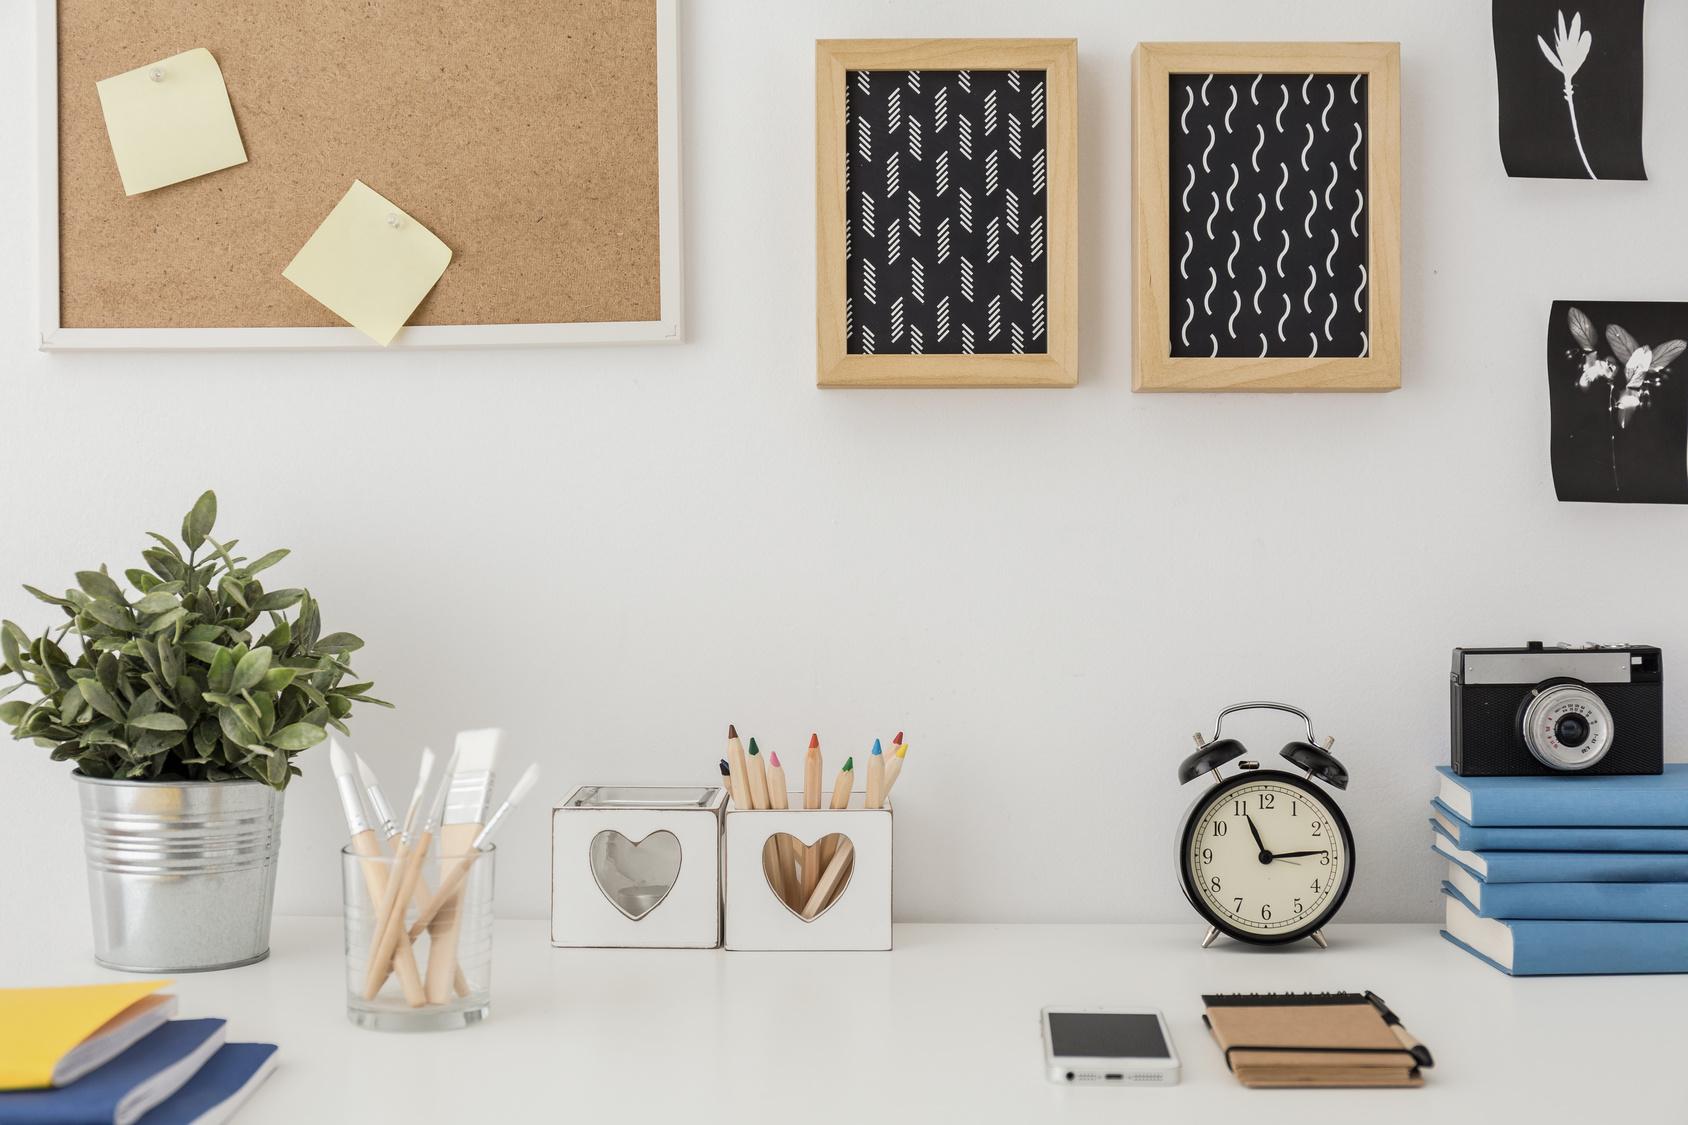 15-end-of-year-tasks-for-freelancers